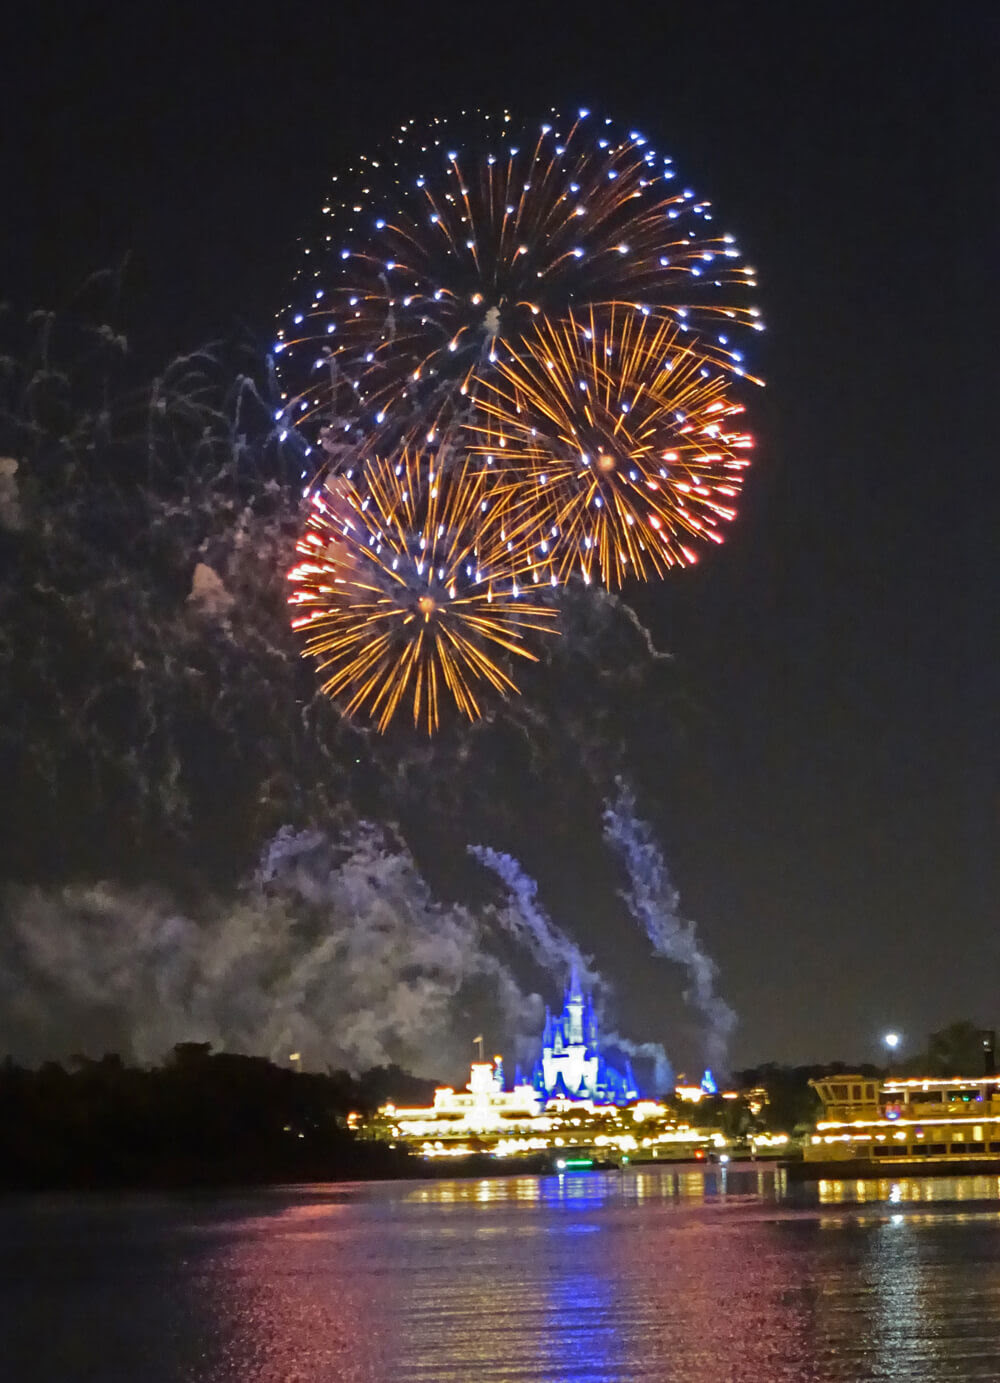 Disney World Holiday Crowds - Wishes